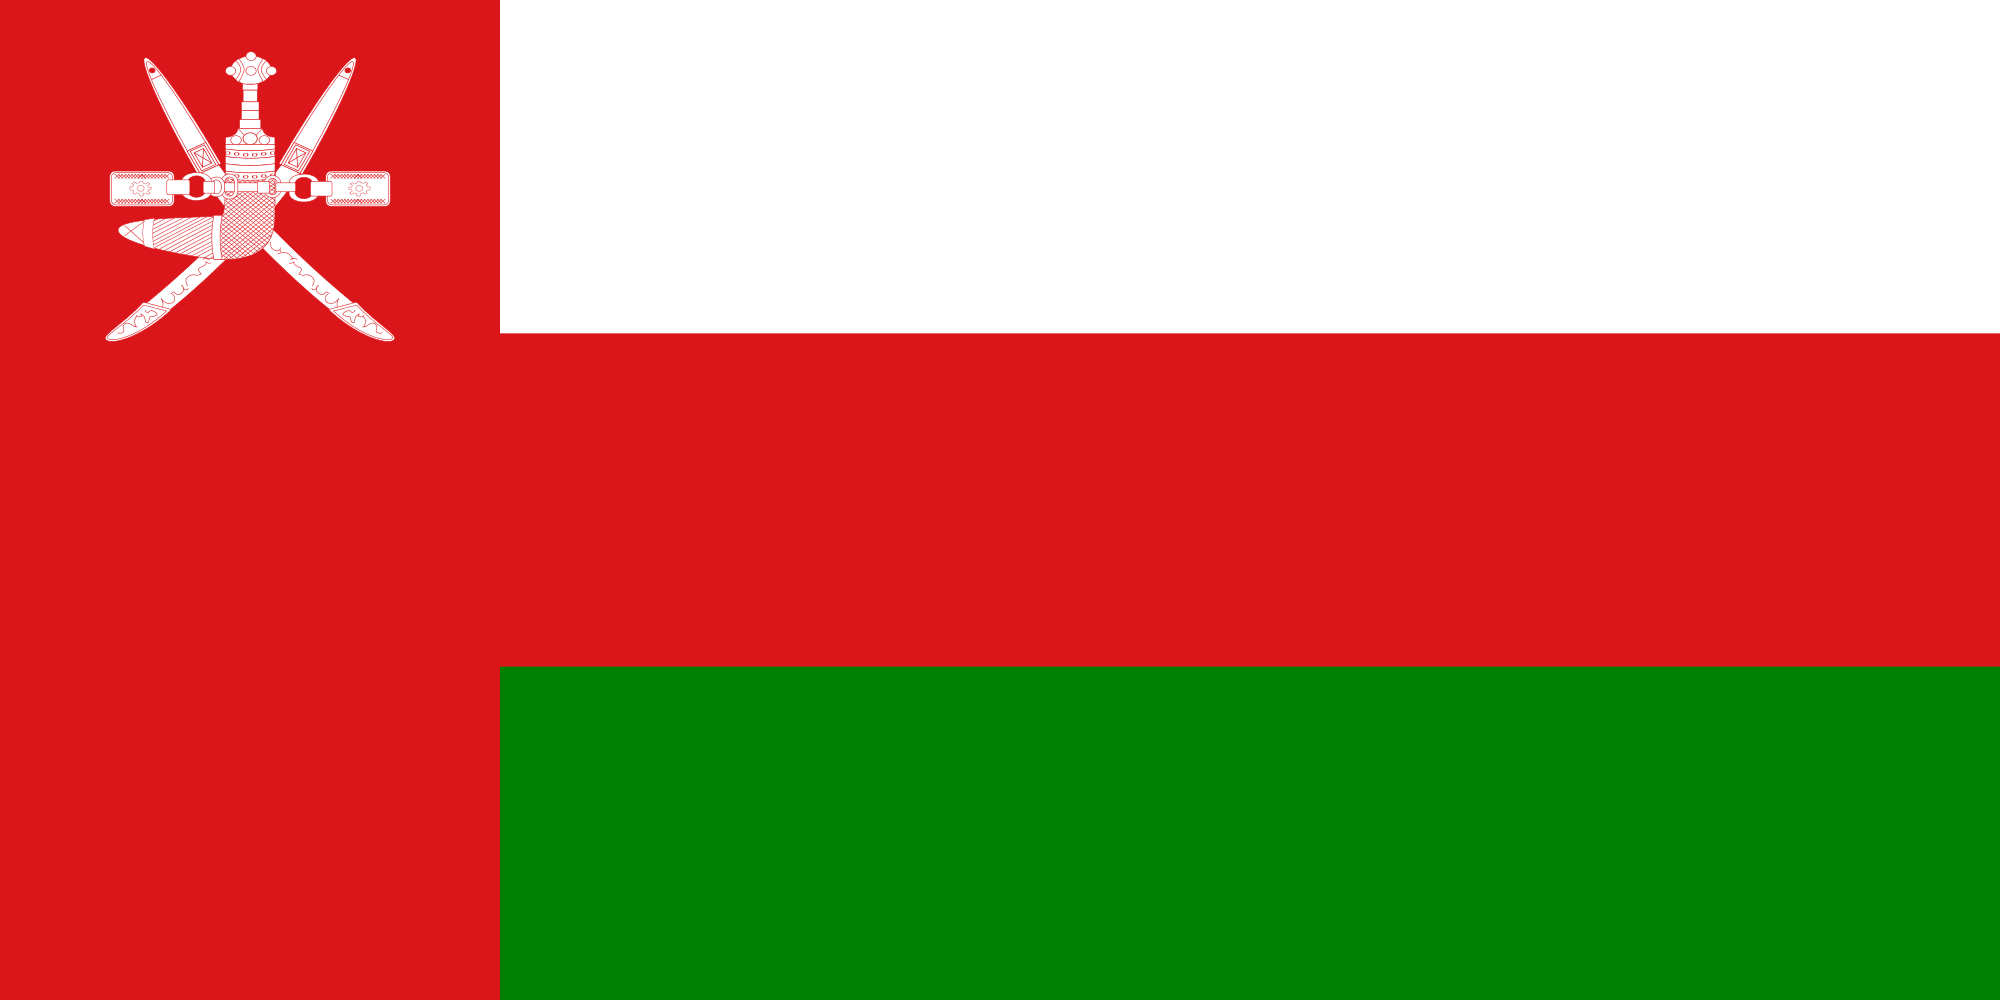 Jordan Jordanian Flag Magnet 4x6 inch International Flag Decal for Car or Fridge